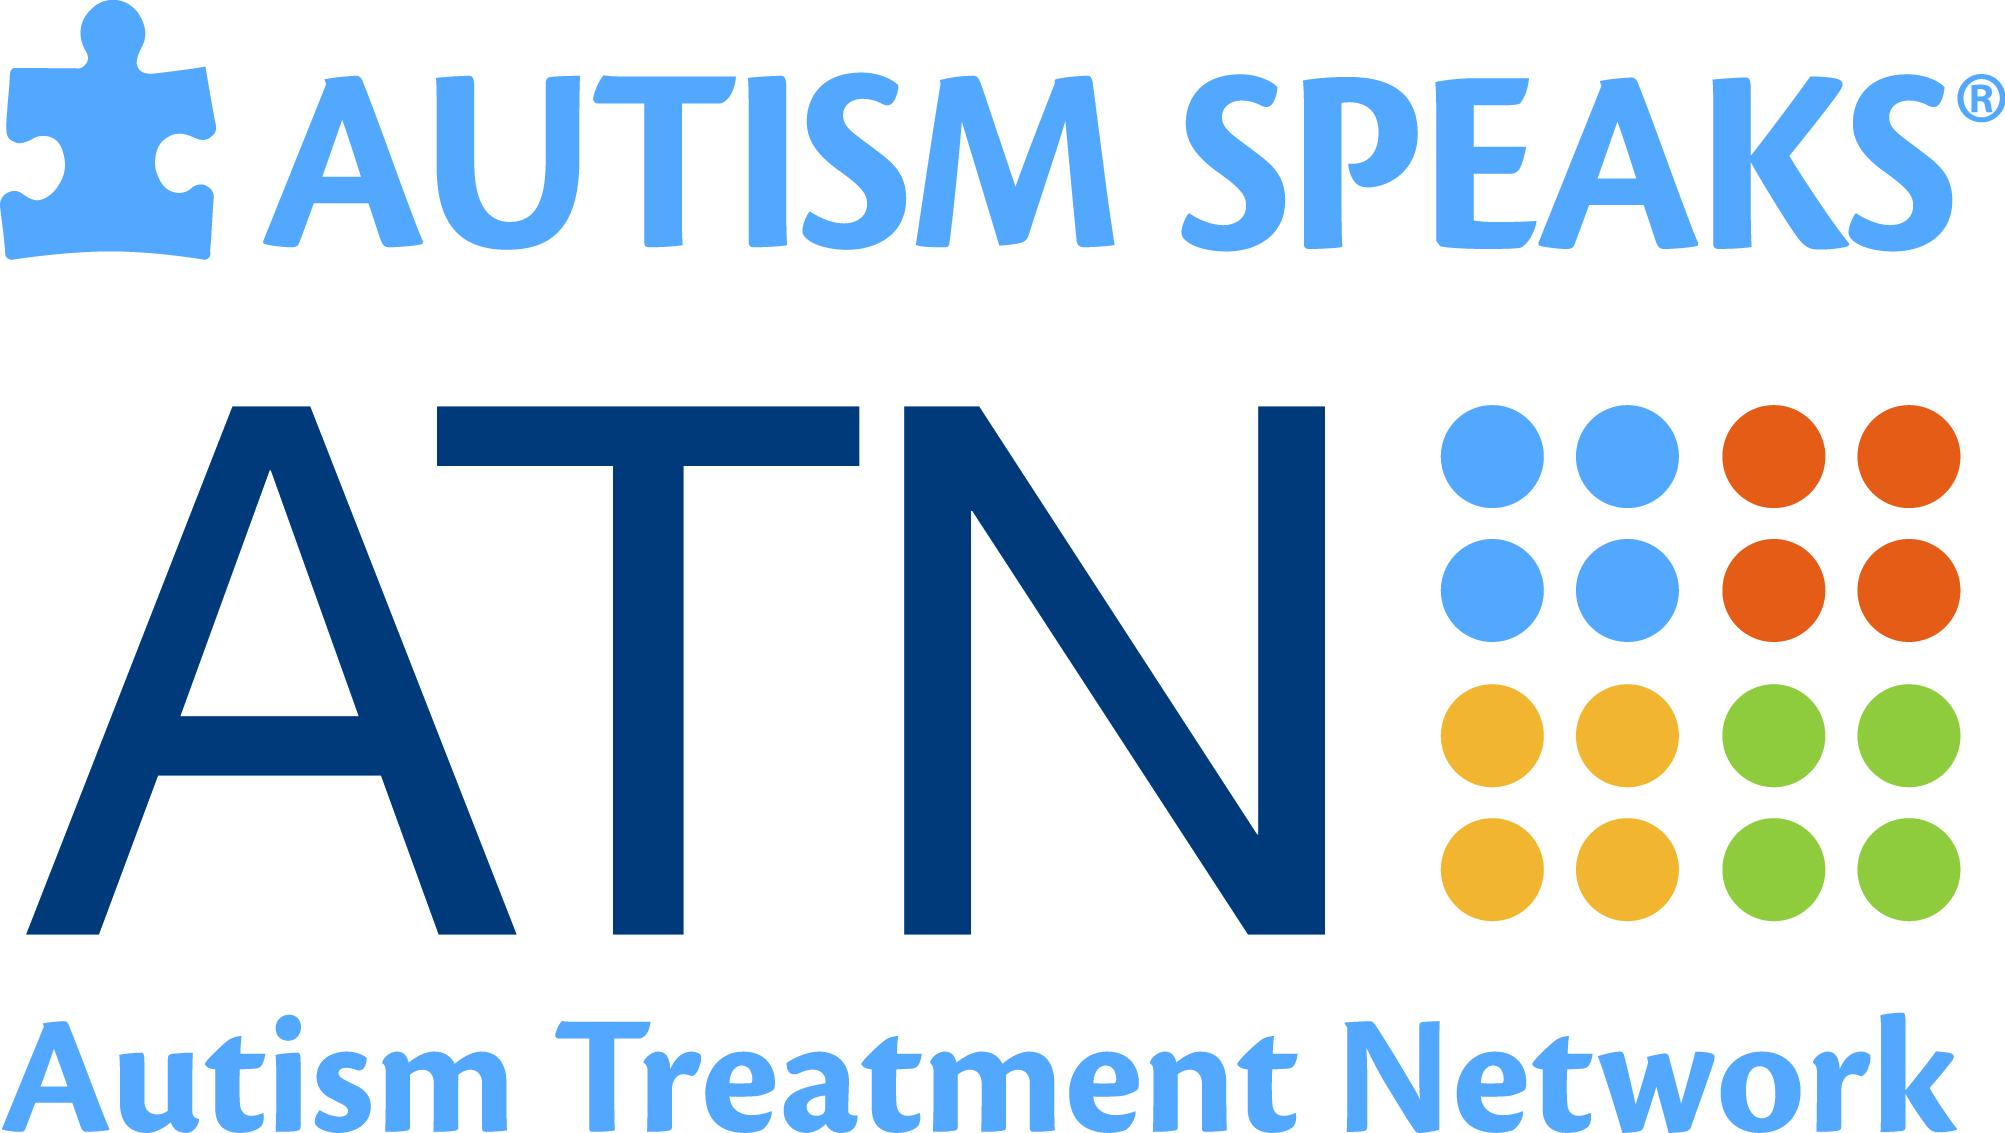 Autism Treatment Network.